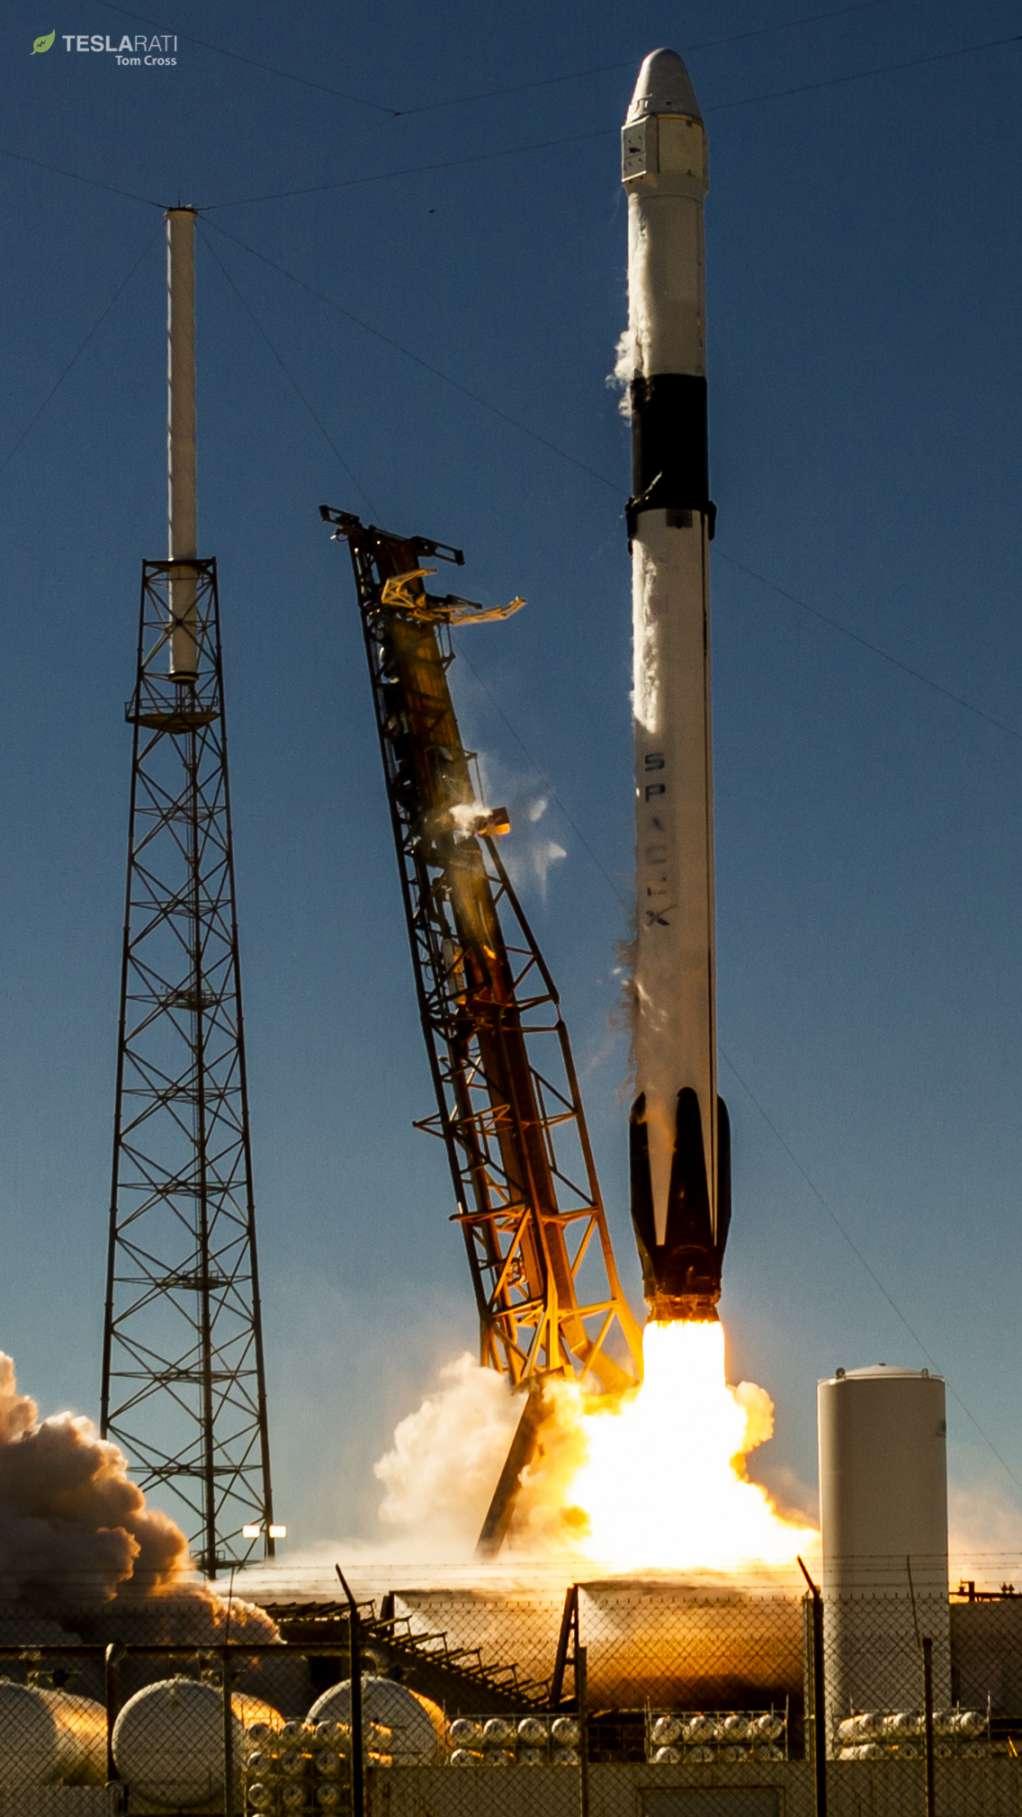 Falcon 9 B1050 launch (Tom Cross) 3(c)